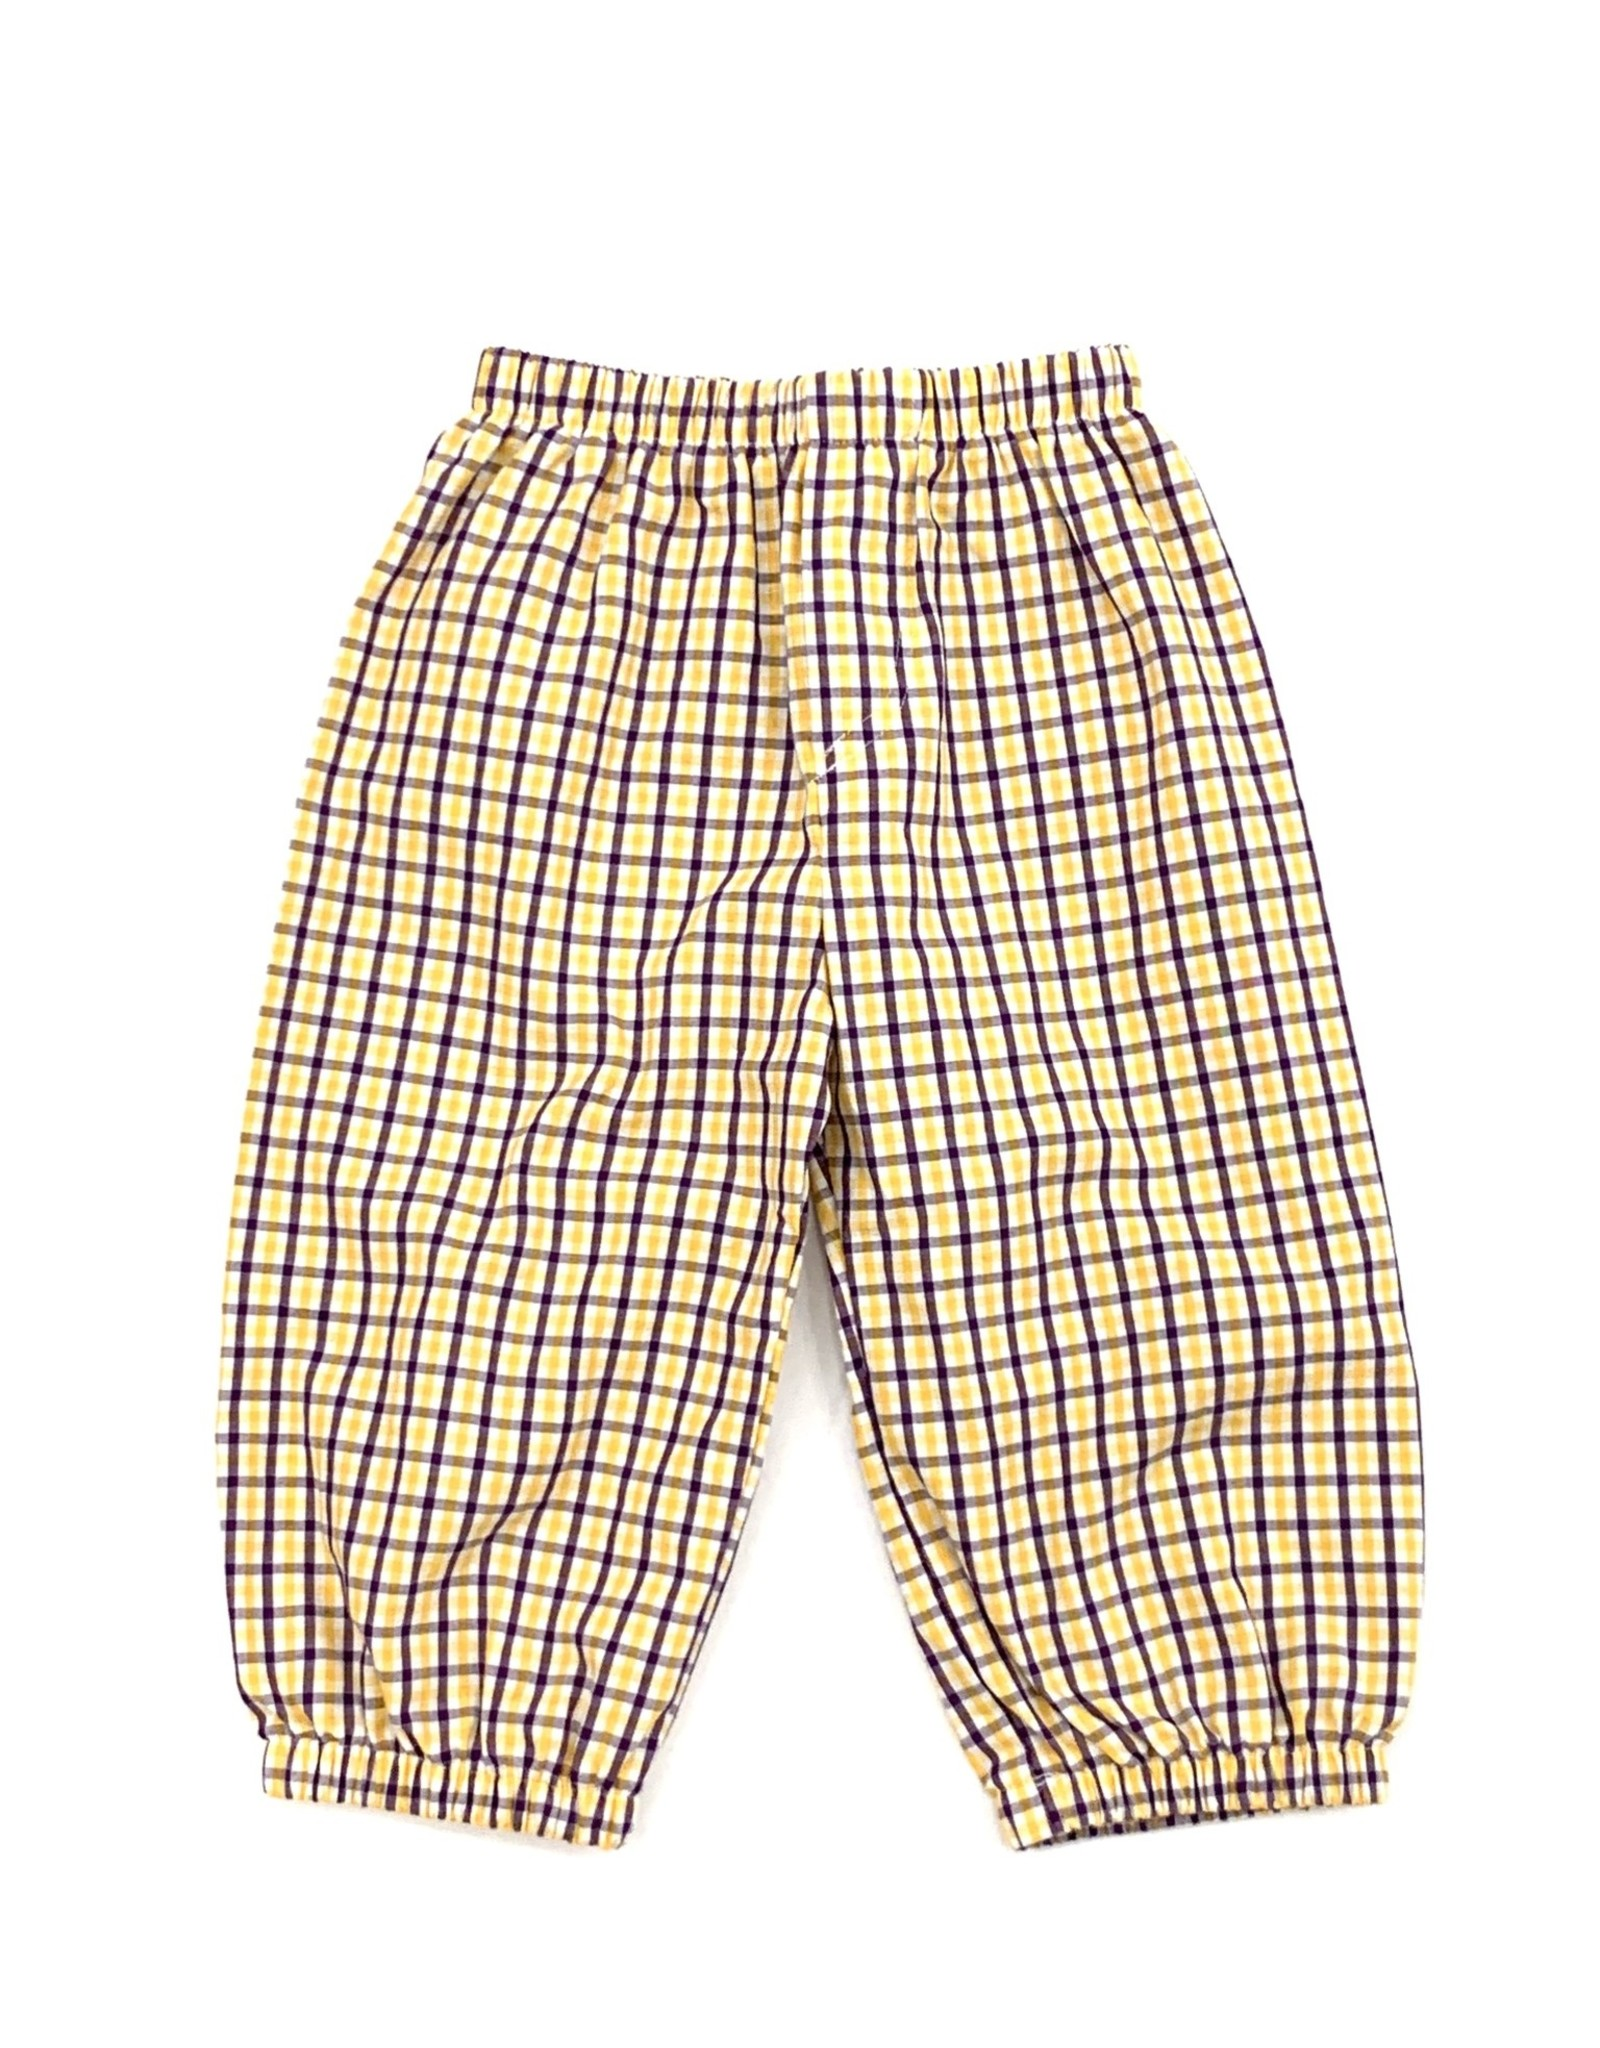 Funstyle LSU Boys Bubble Pants